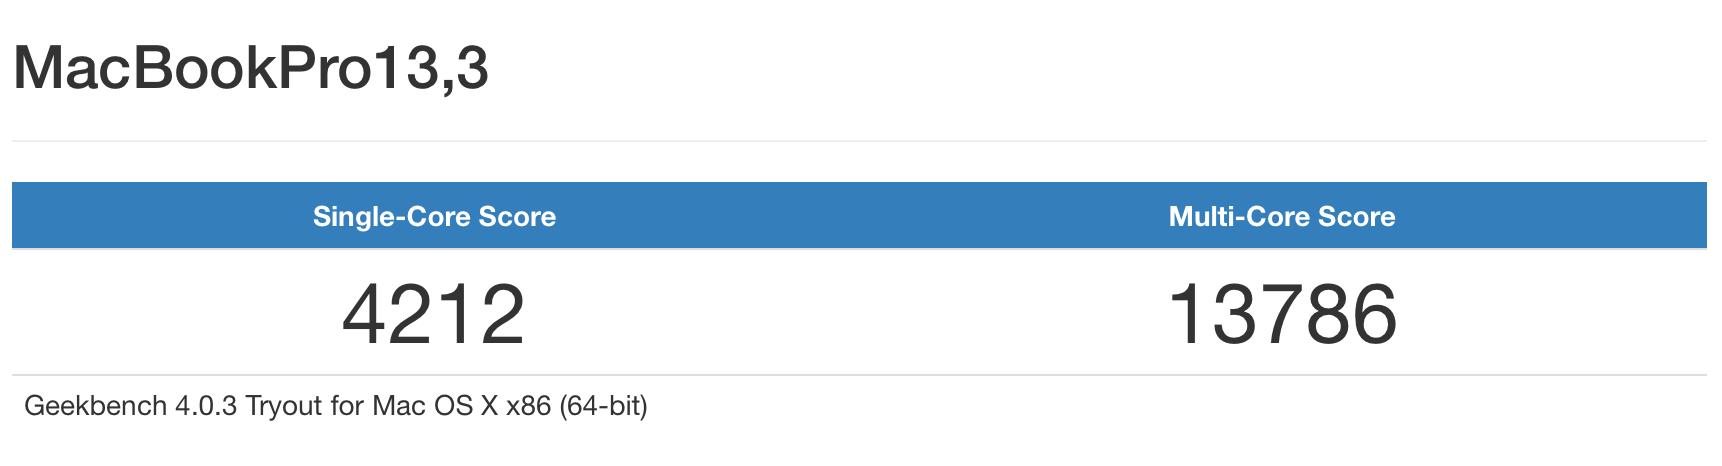 %e3%82%b9%e3%82%af%e3%83%aa%e3%83%bc%e3%83%b3%e3%82%b7%e3%83%a7%e3%83%83%e3%83%88-2016-12-27-21-22-29